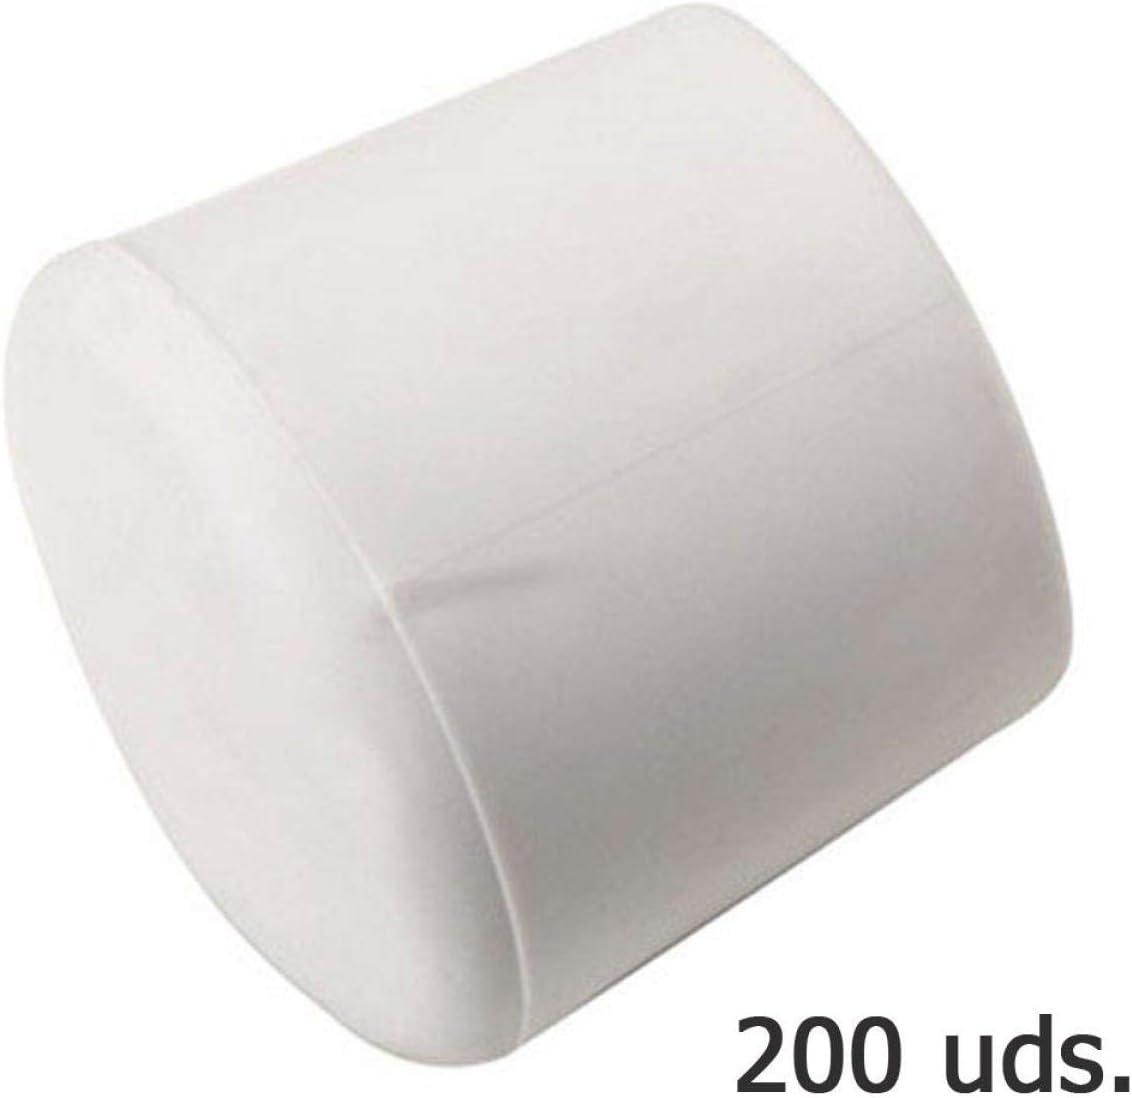 WOLFPACK LINEA PROFESIONAL 5330344 Contera Plastico Redonda Exterior Blanca 22 mm Bolsa 200 Unidades